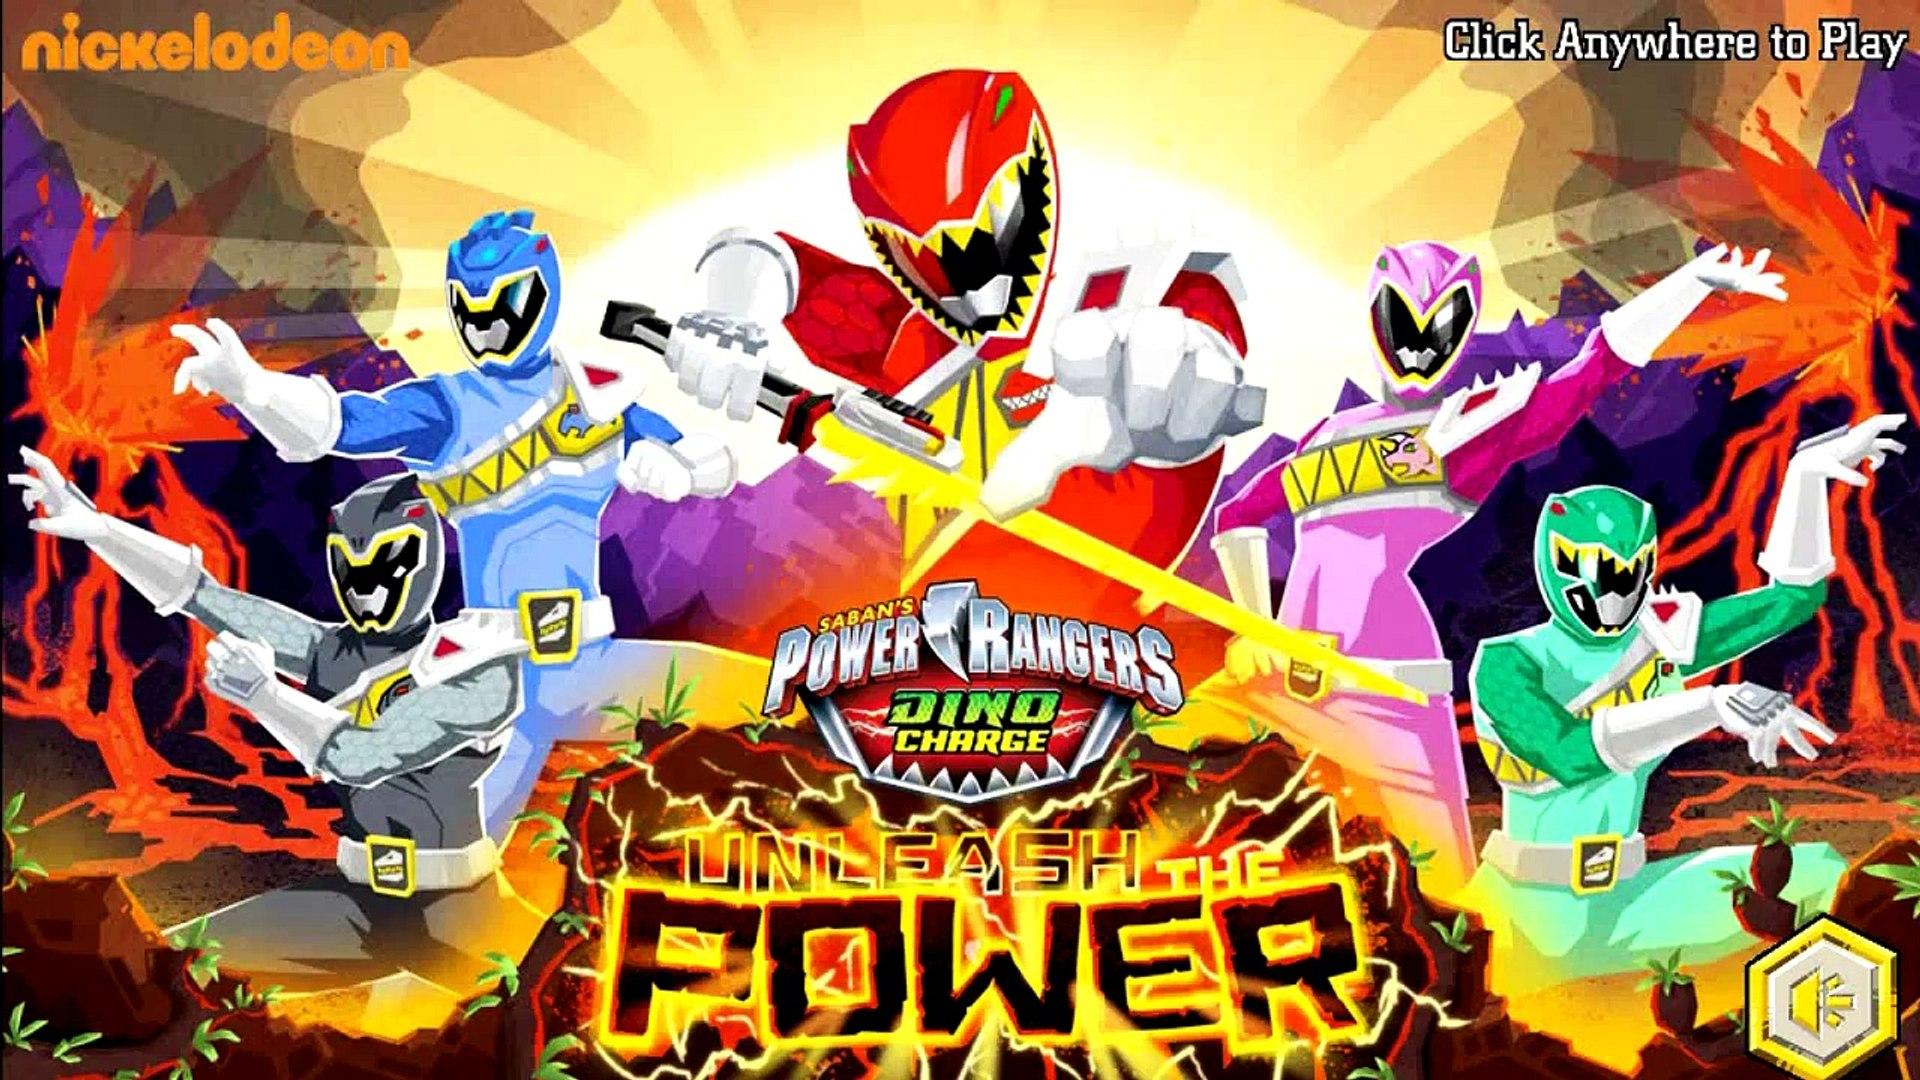 Power Rangers Dino Charge - Power Rangers Super Legends [ Full Gameplay ] - Power Rangers Games